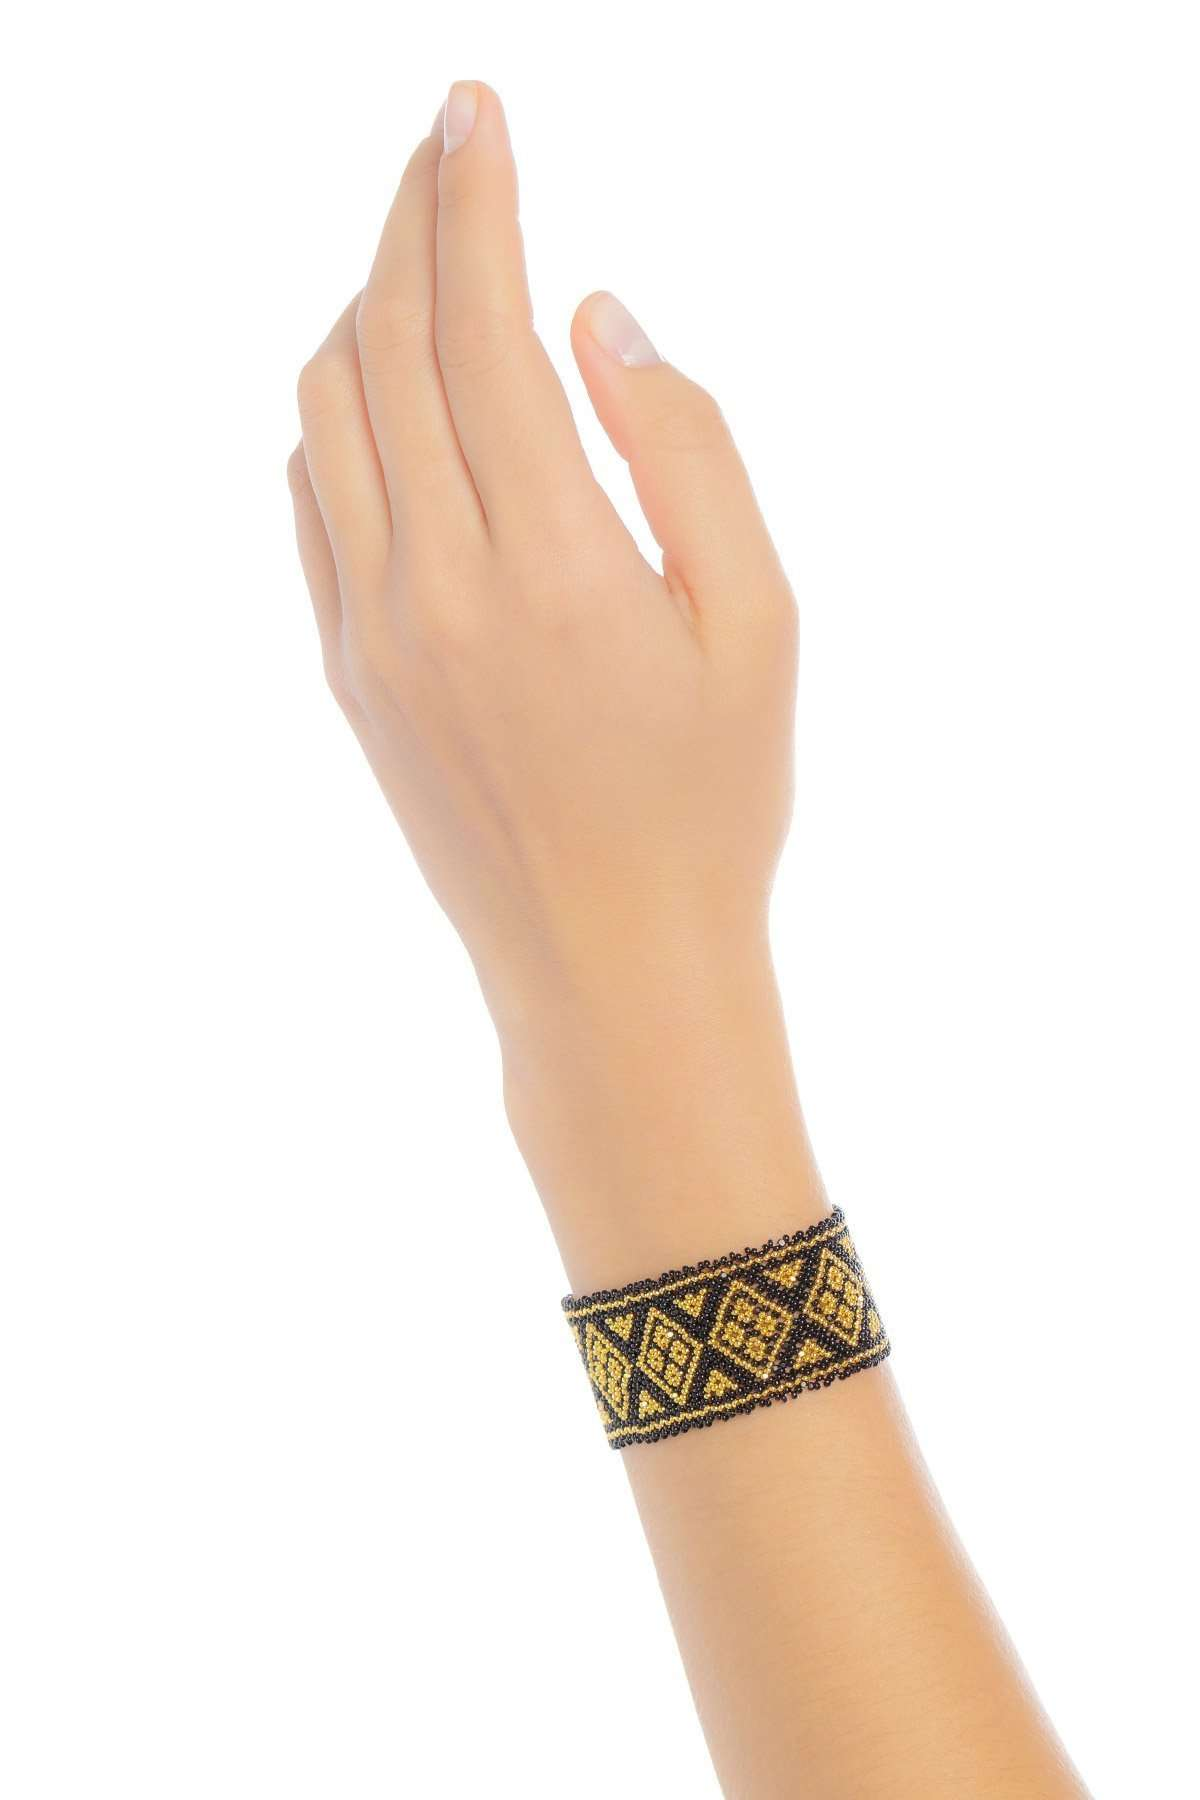 016-brazaletes-mediano-oro-negro-alt1